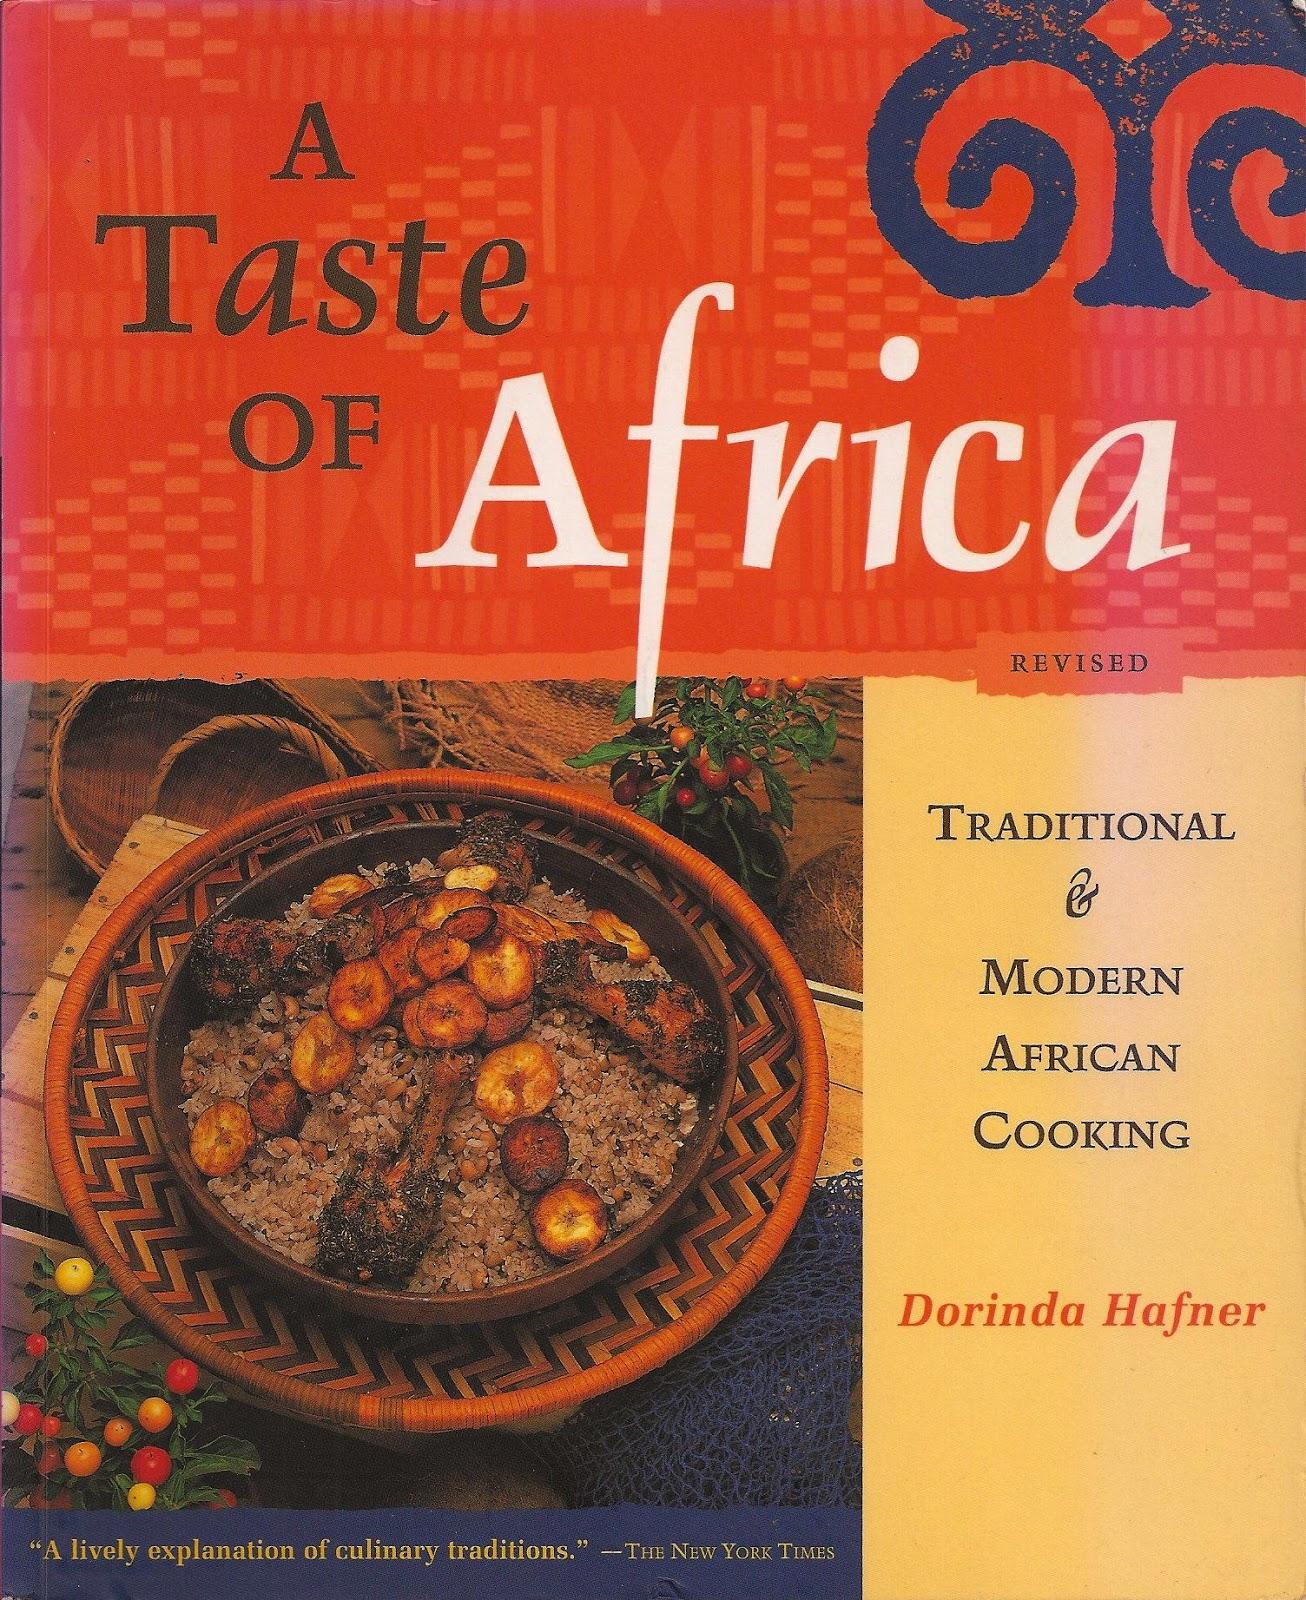 Dumpling Soup Woolworths Languageen: BetumiBlog: On My African Cookbook Shelf